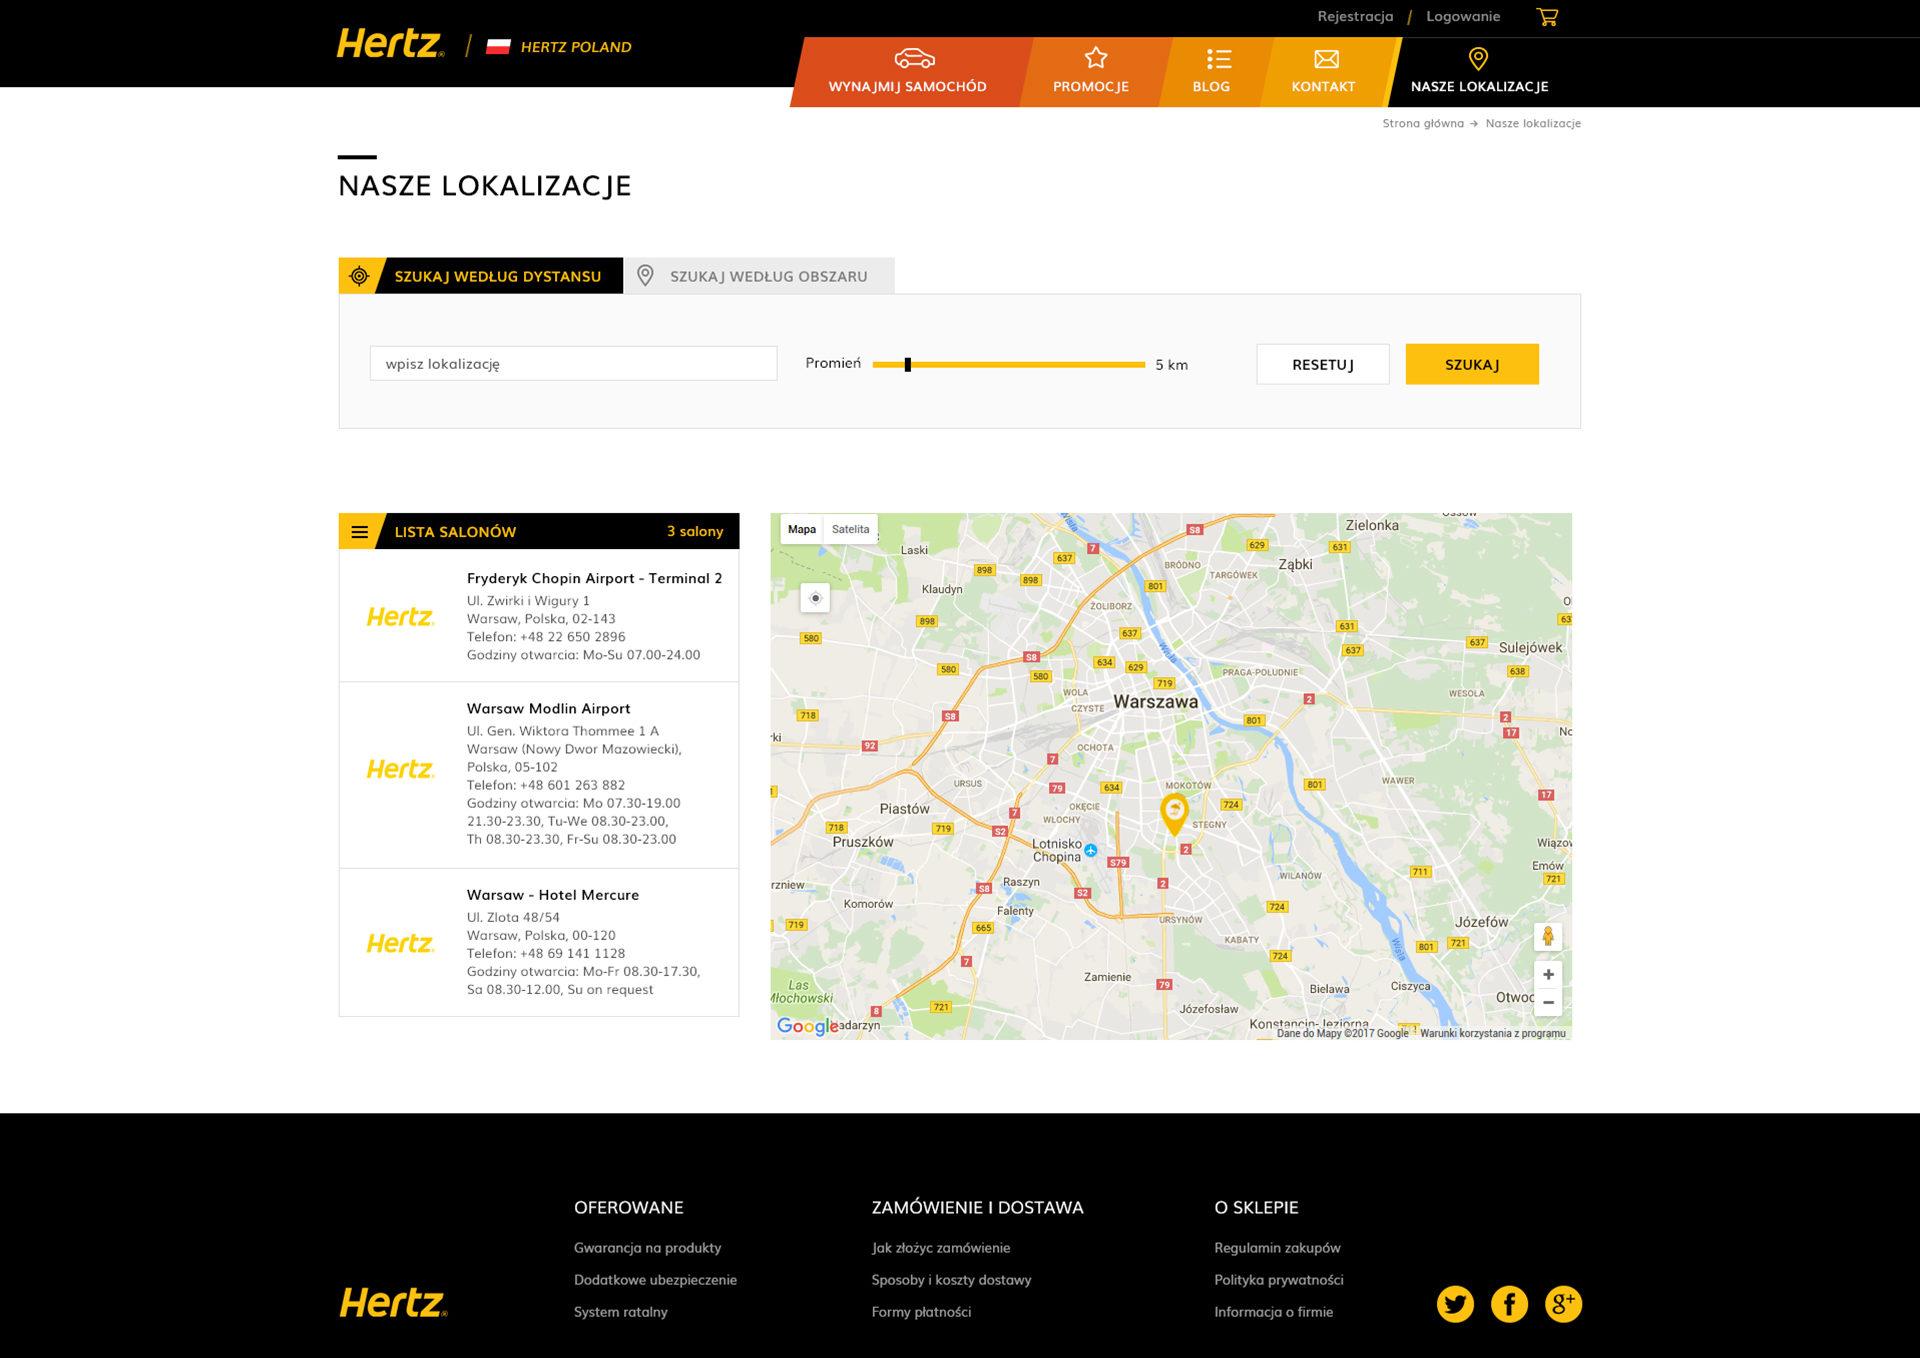 Hertz Polska Magento Ecommerce nasze lokalizacje